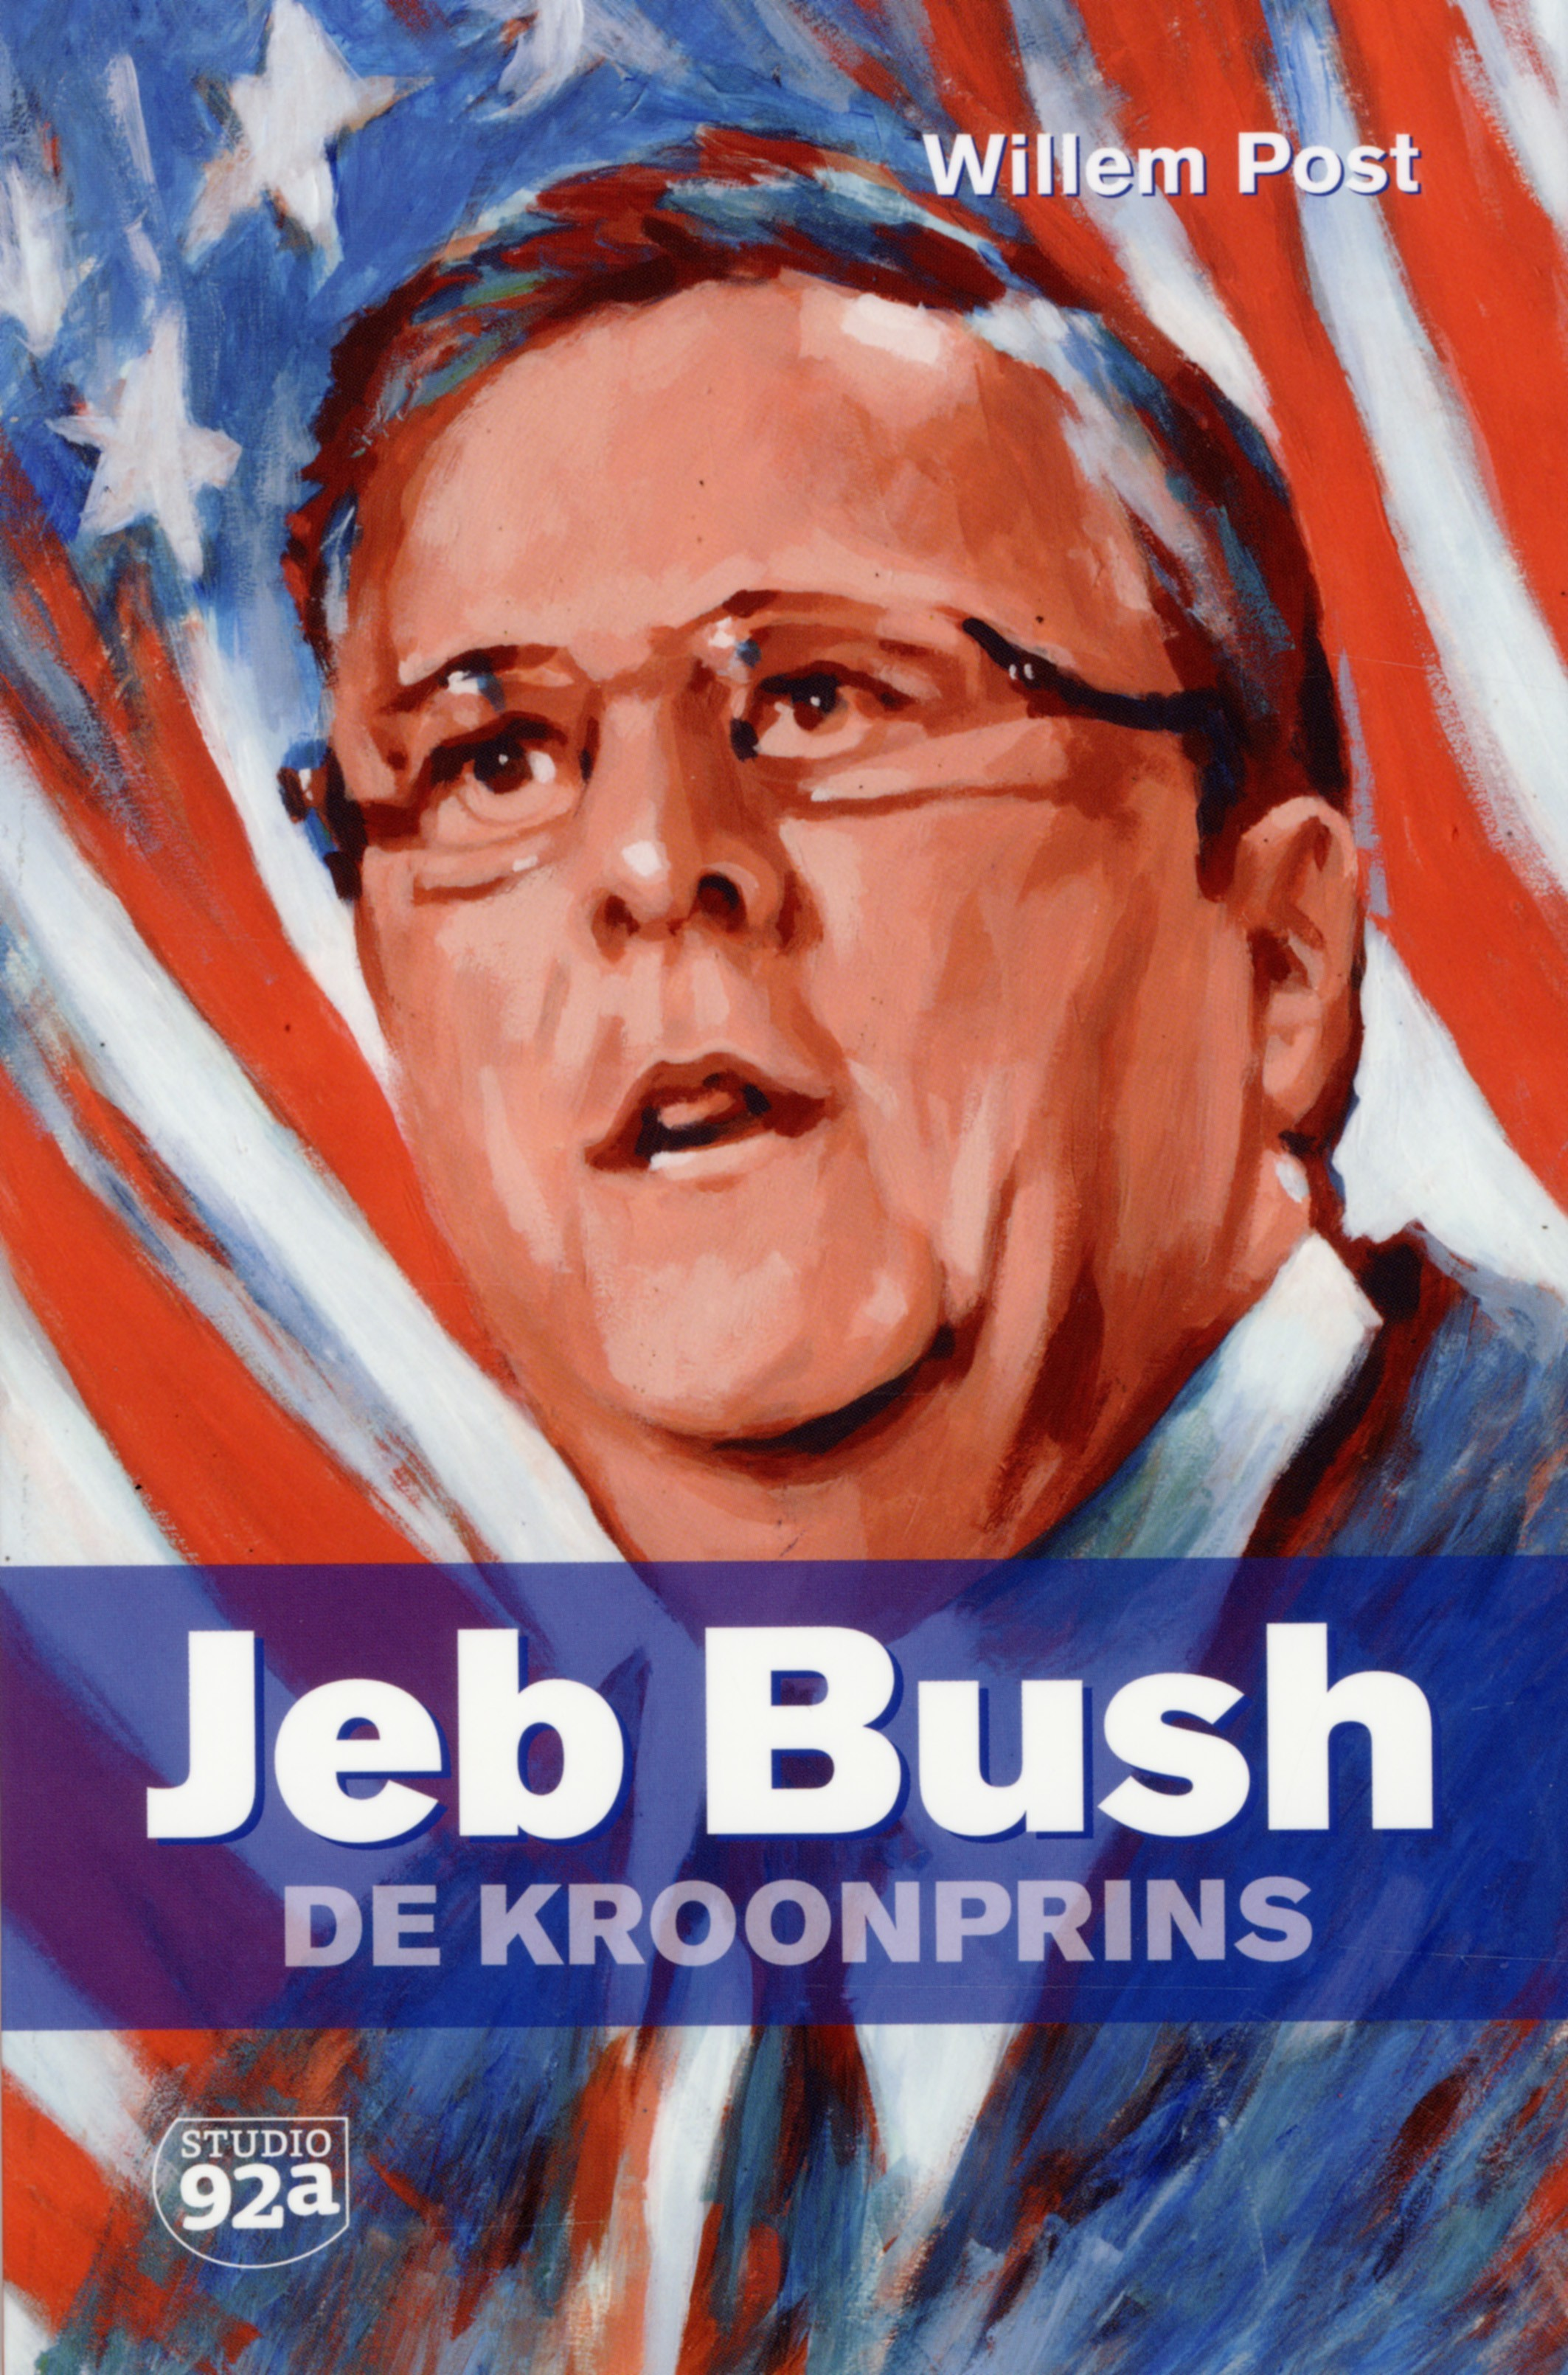 Jeb Bush - de kroonprins  by  willem post